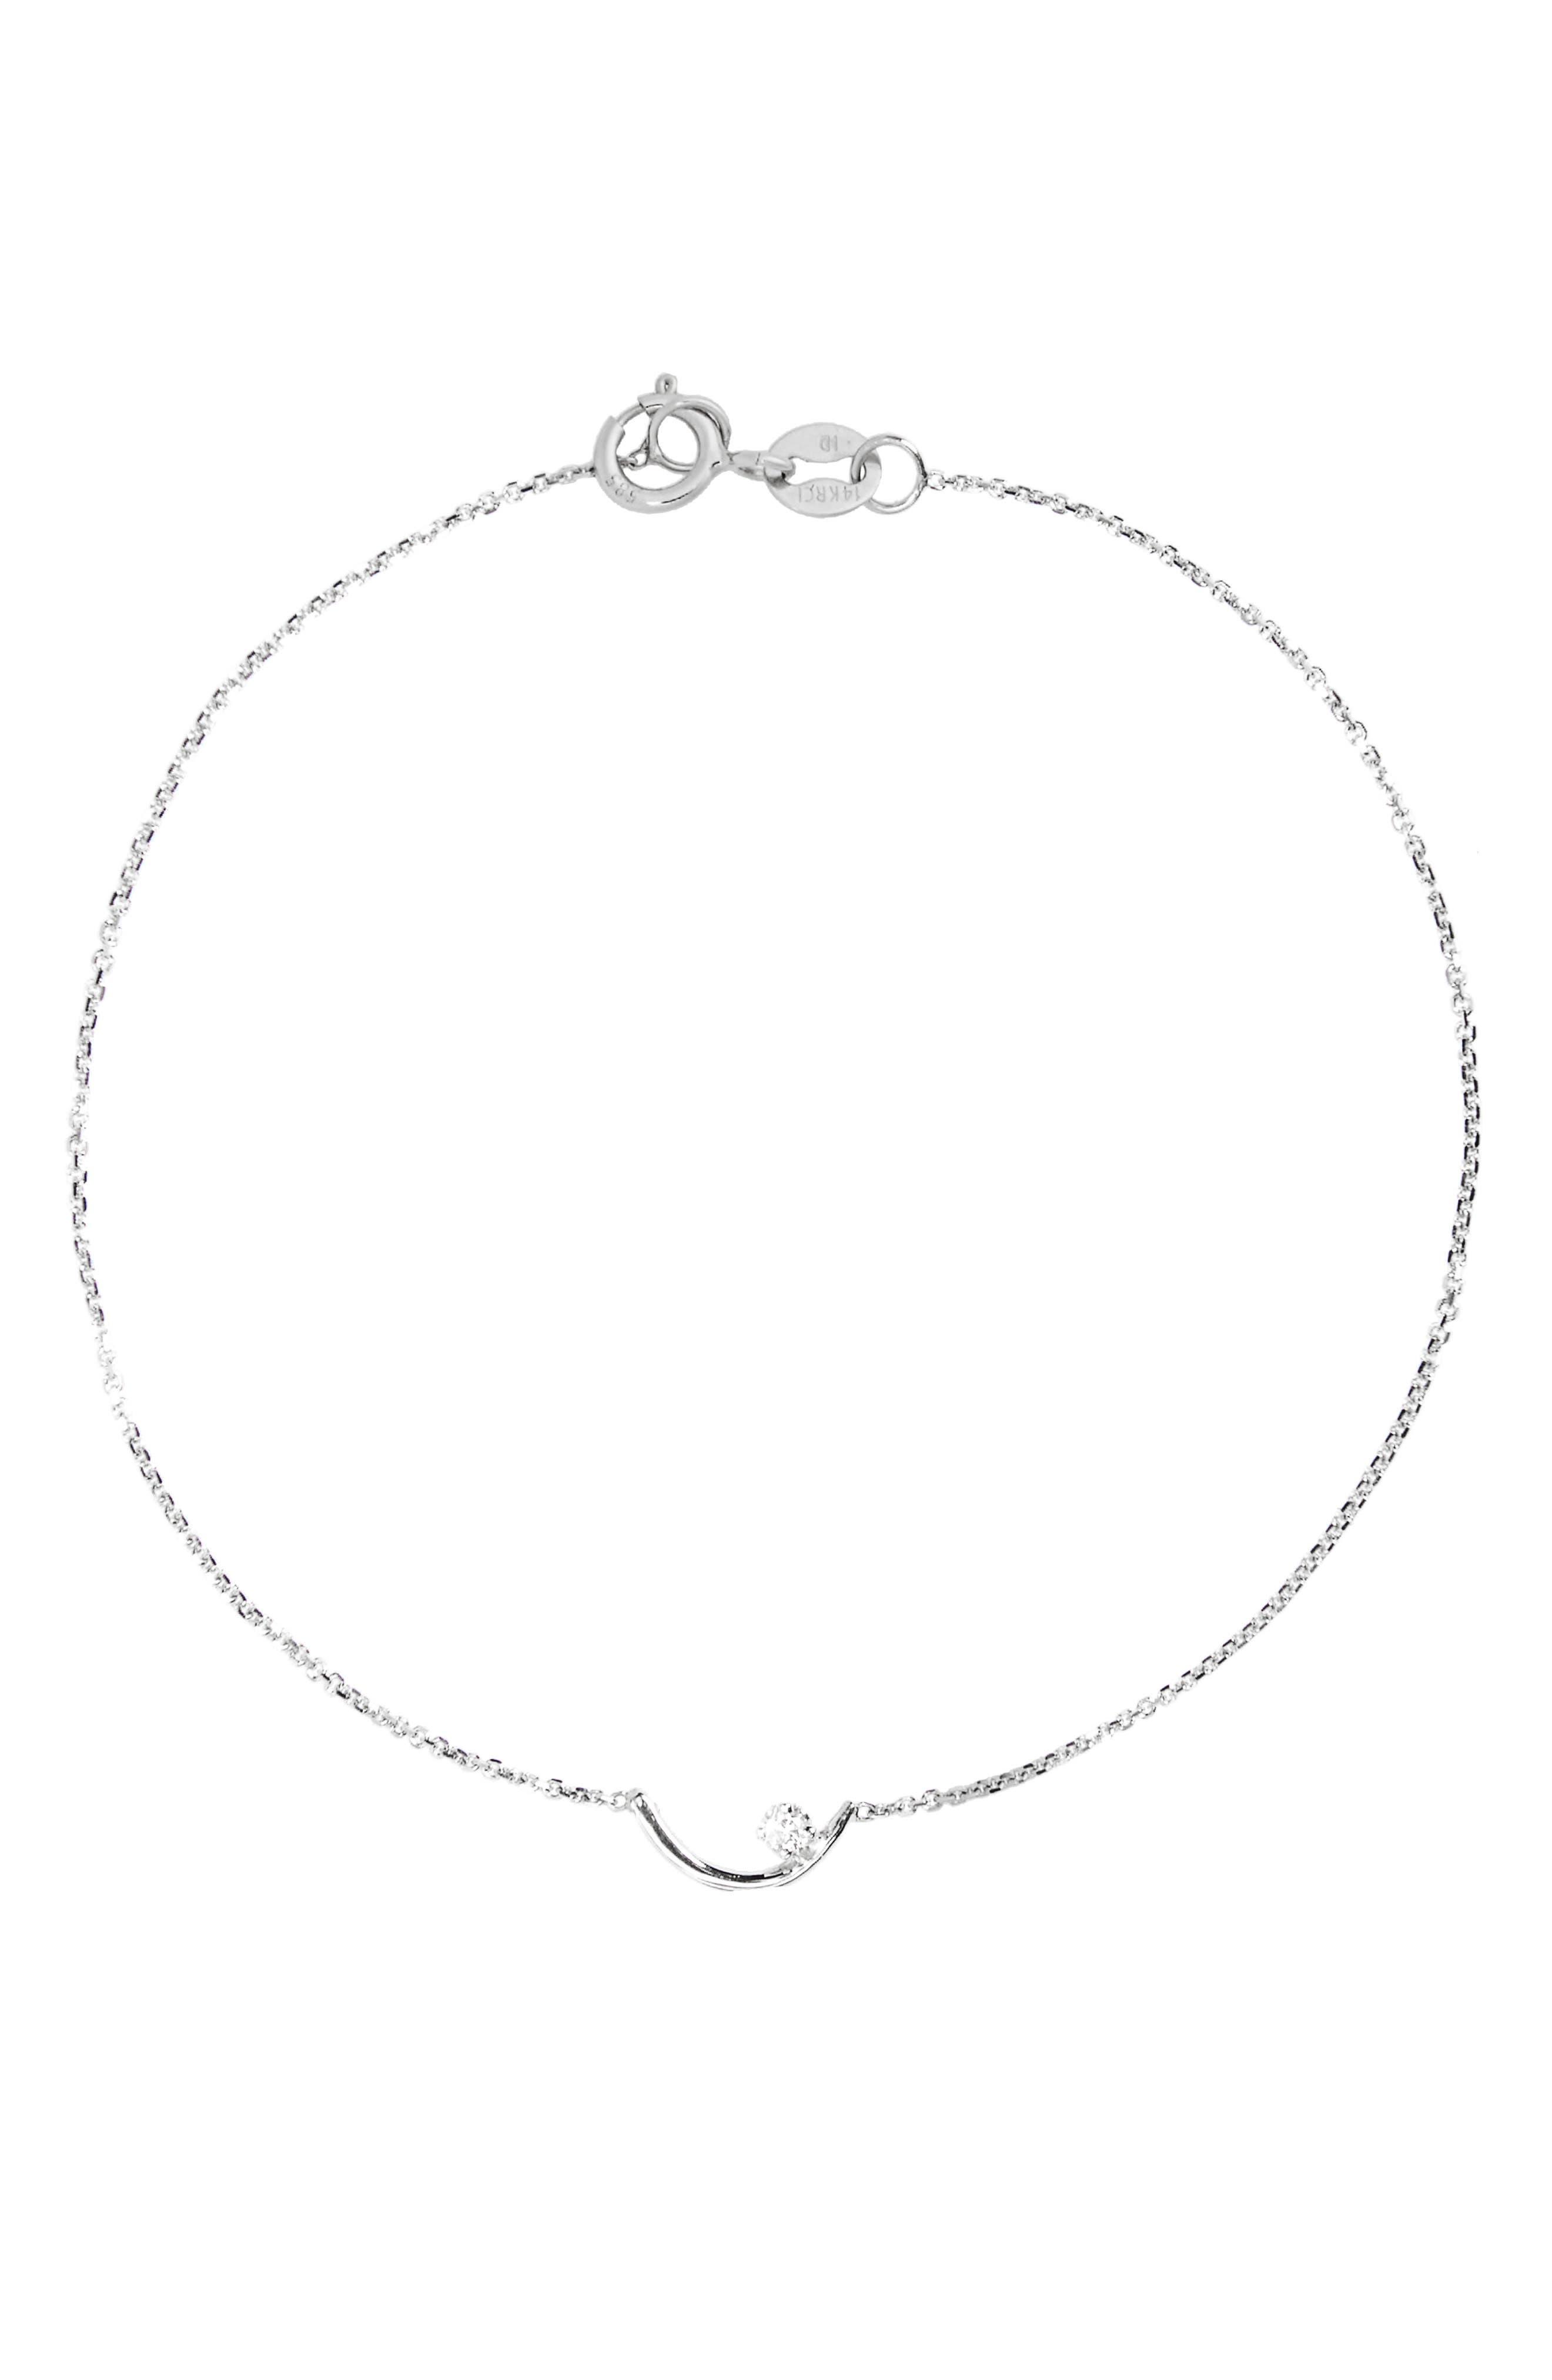 Arc Lineage Diamond Bracelet,                             Main thumbnail 1, color,                             STERLING SILVER/ WHITE DIAMOND